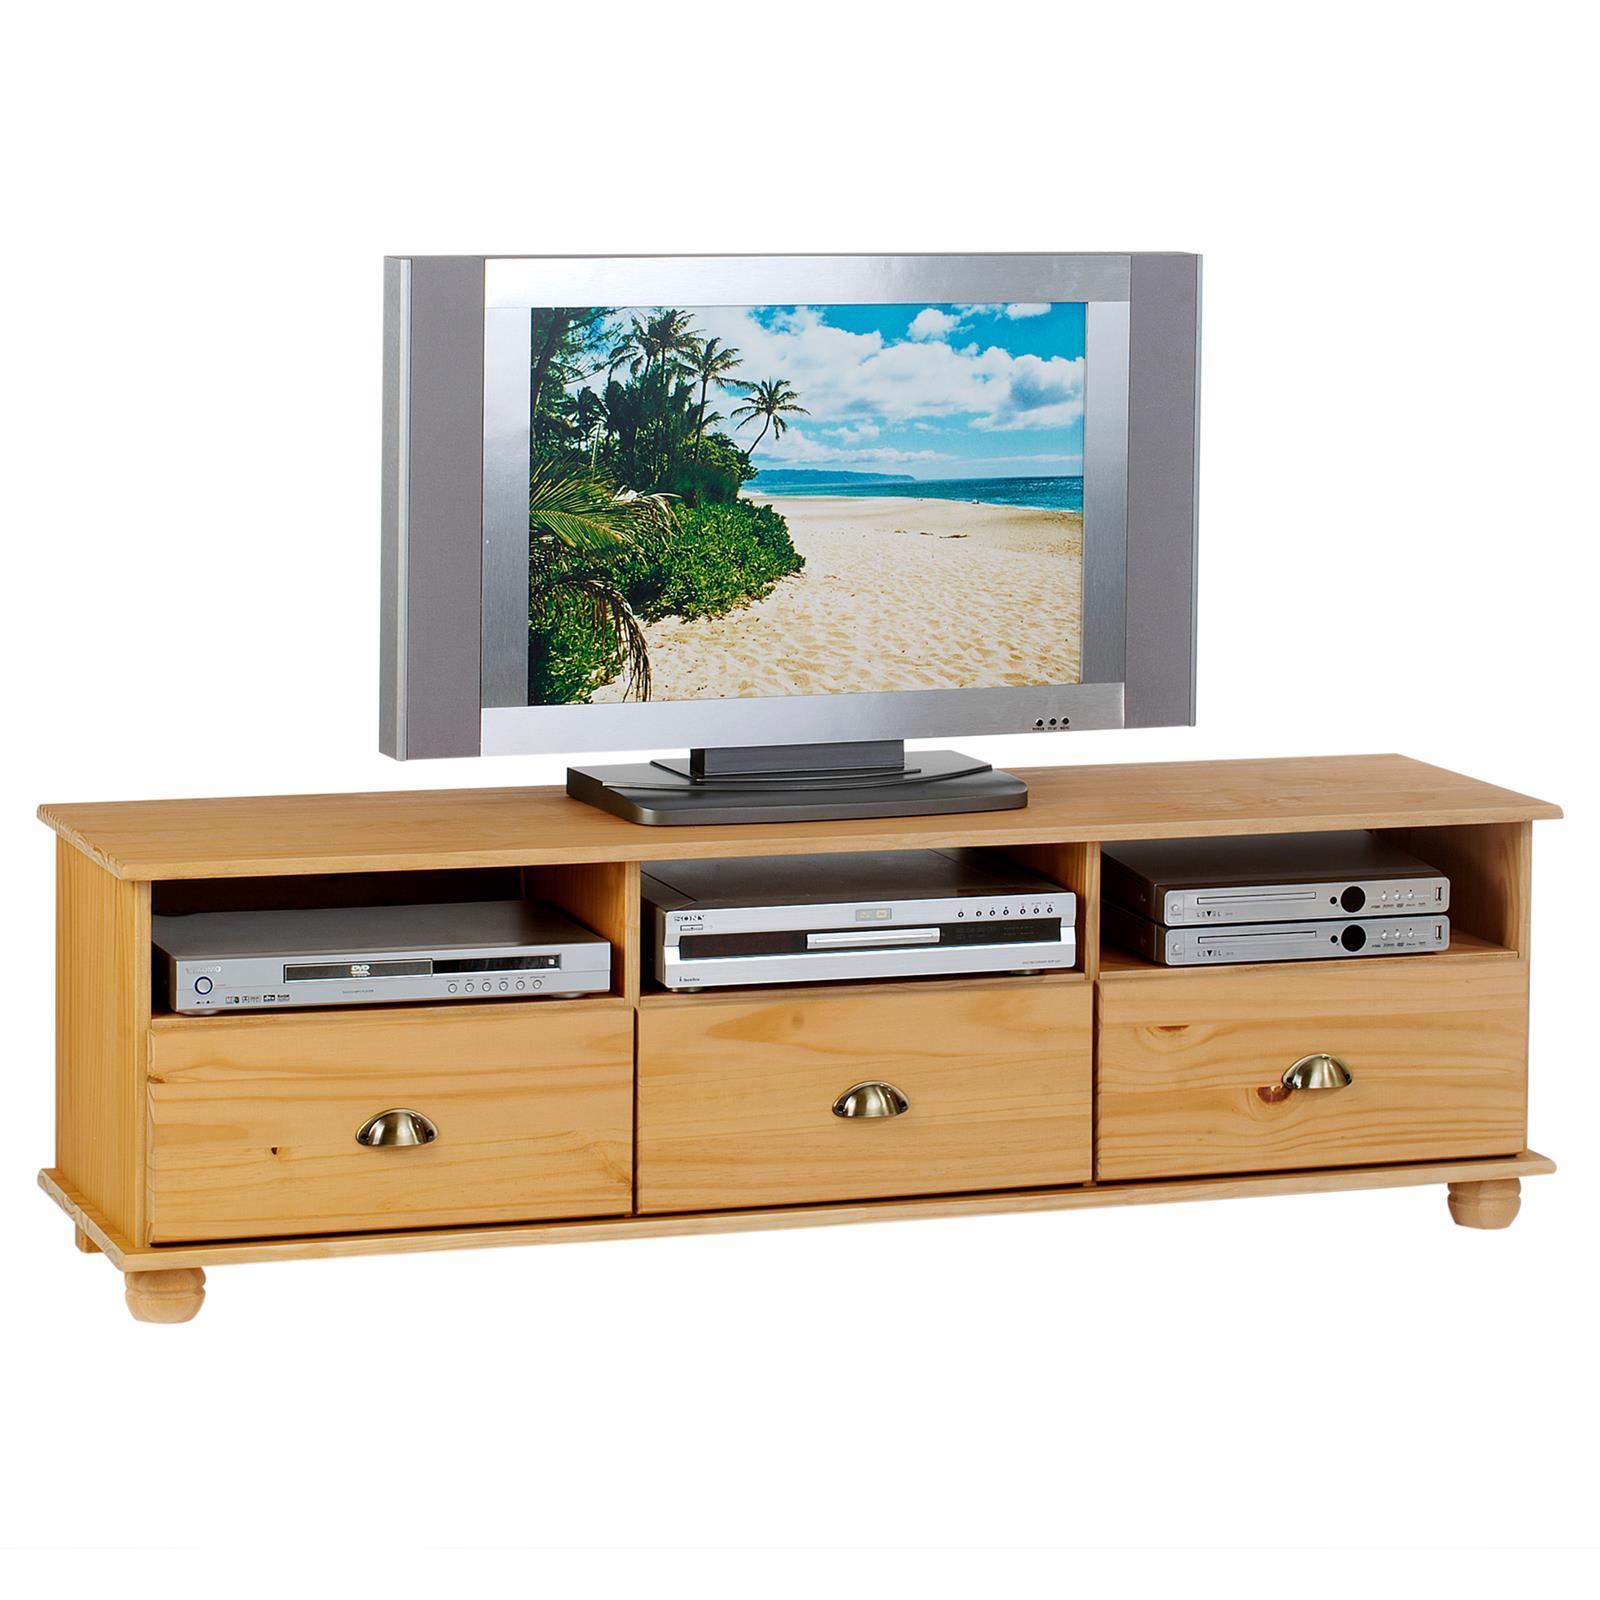 Meuble tv en pin colmar 3 tiroirs 3 niches finition for Meuble tv niche